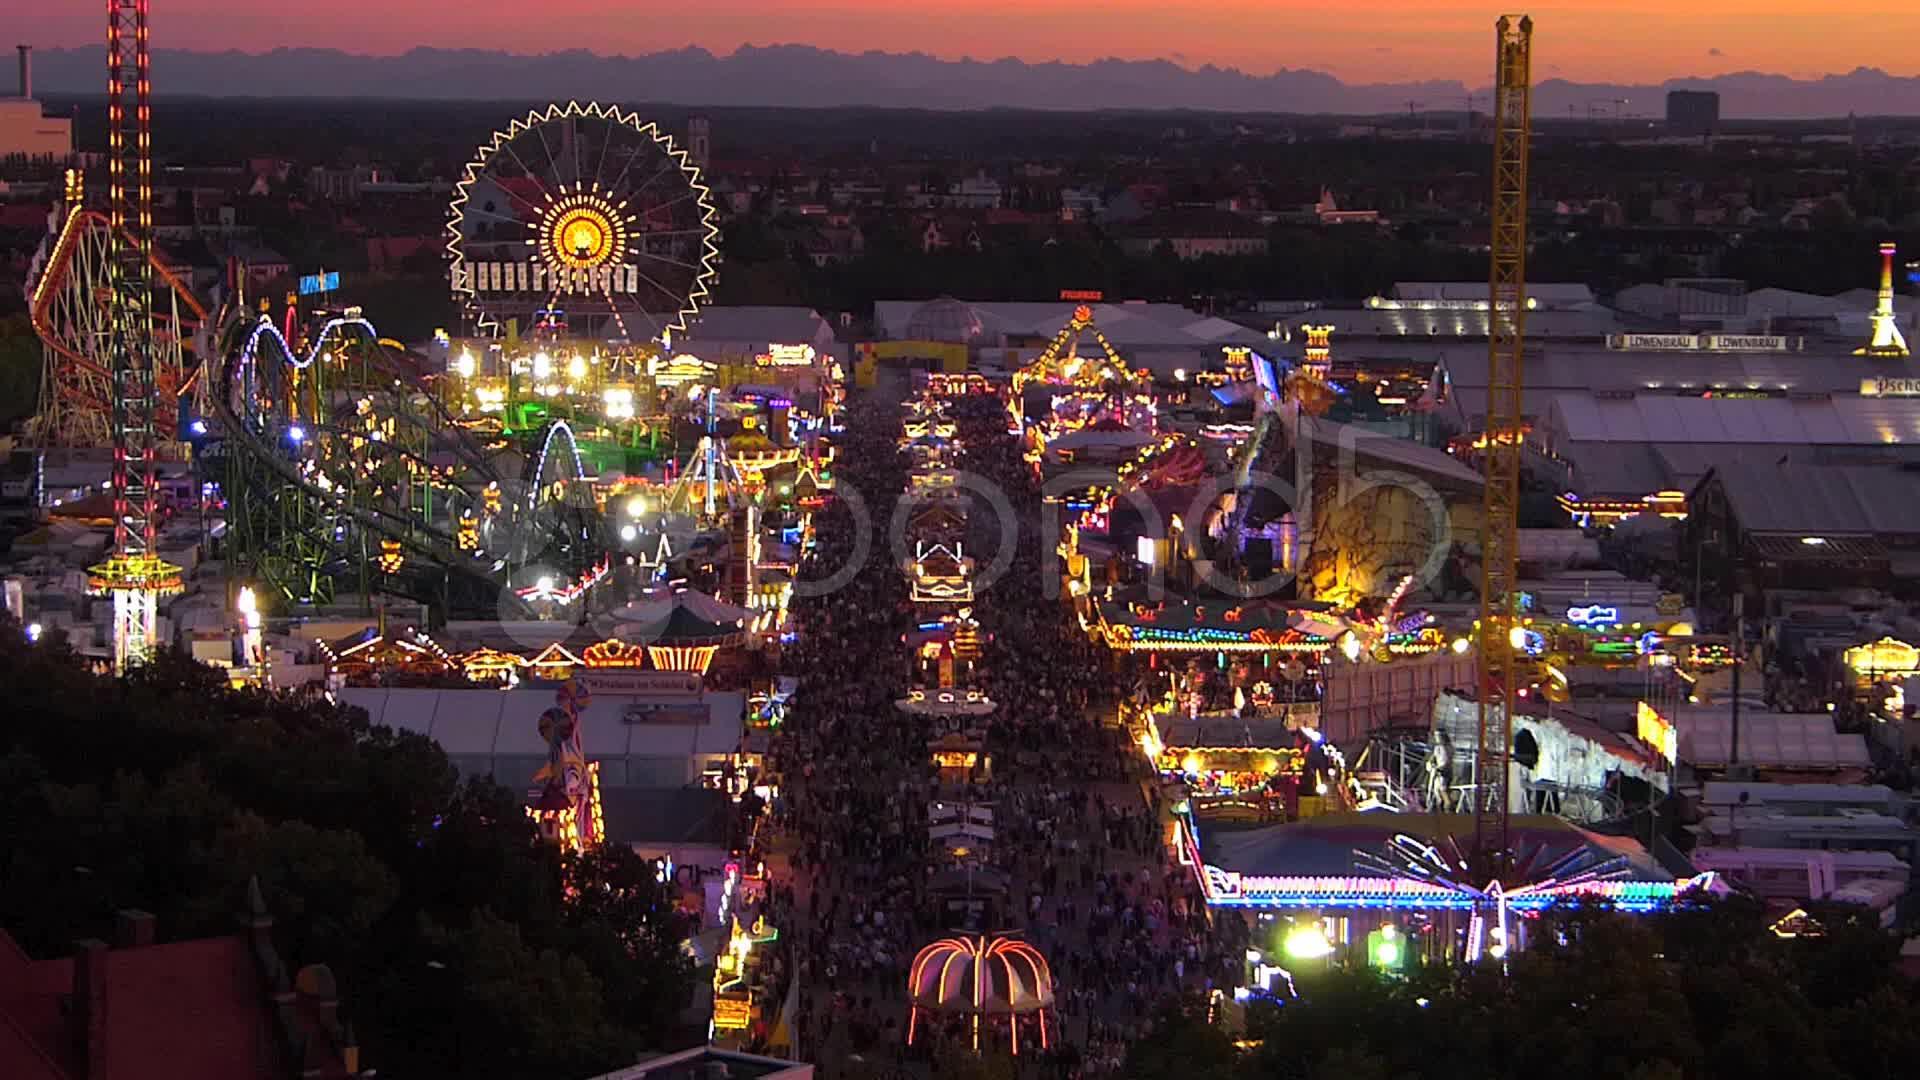 Skyline Oktoberfest Germany Munich Beer Festival Ferris 1920x1080